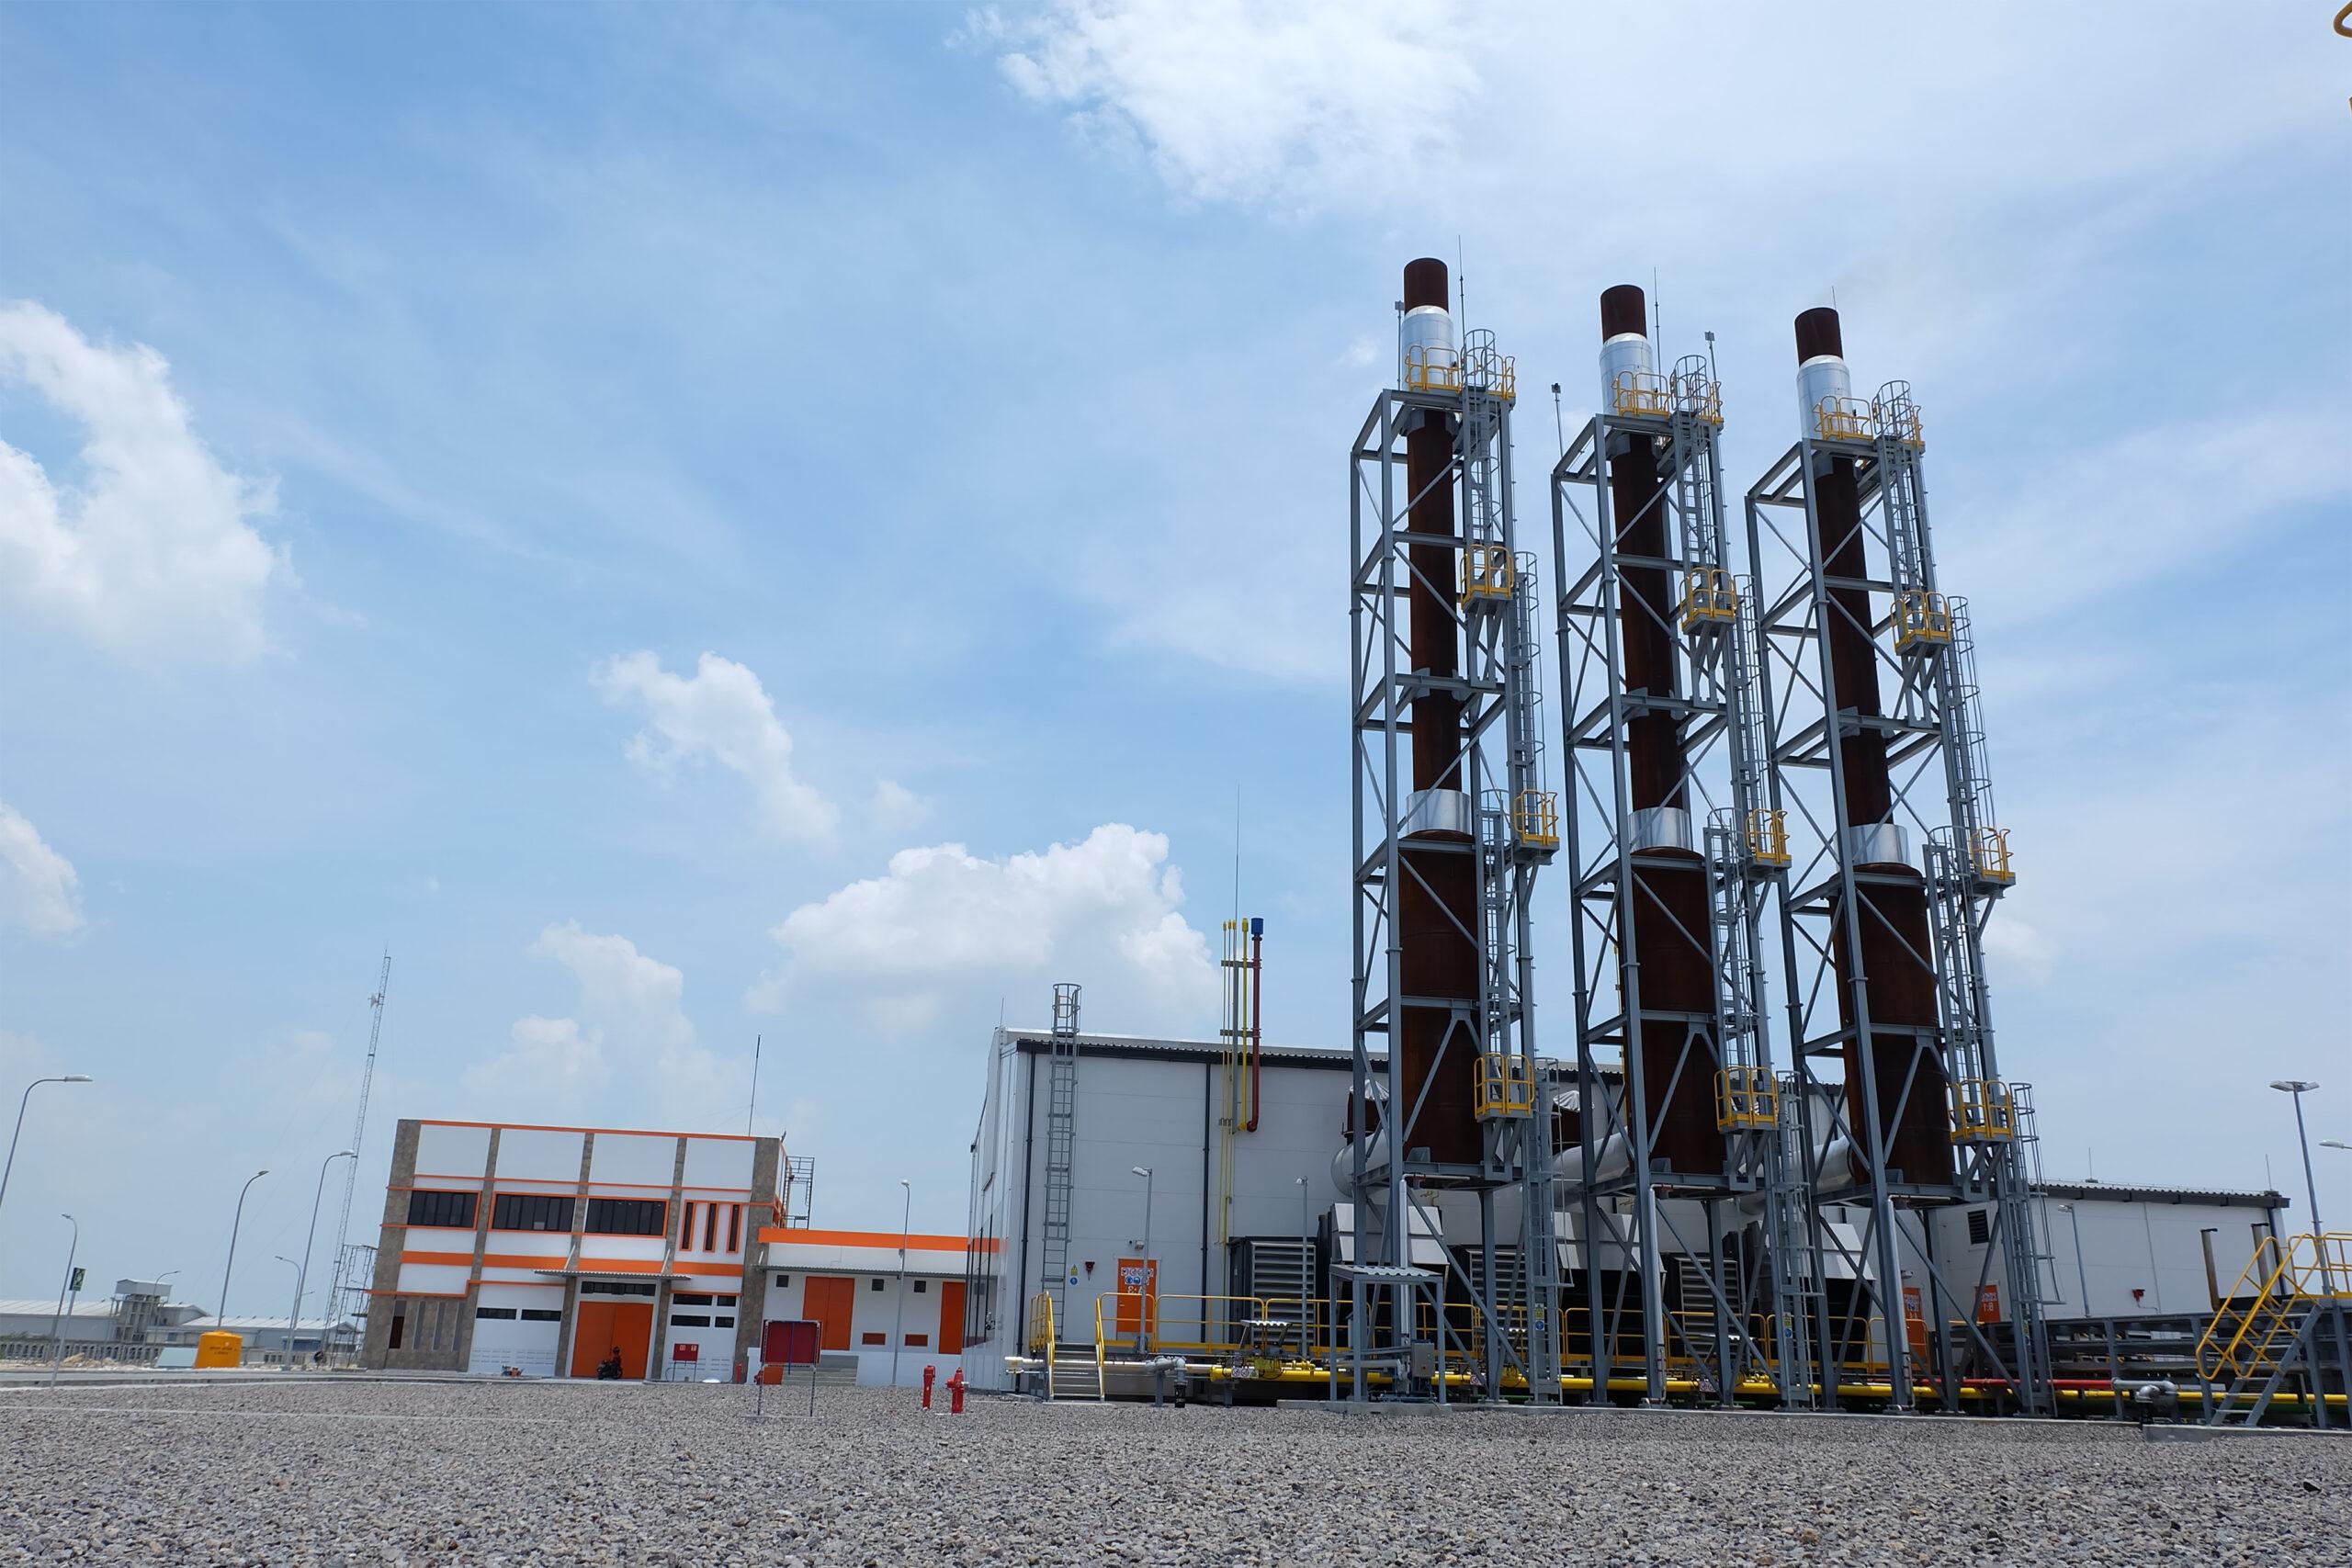 Indonesia Industrial Area